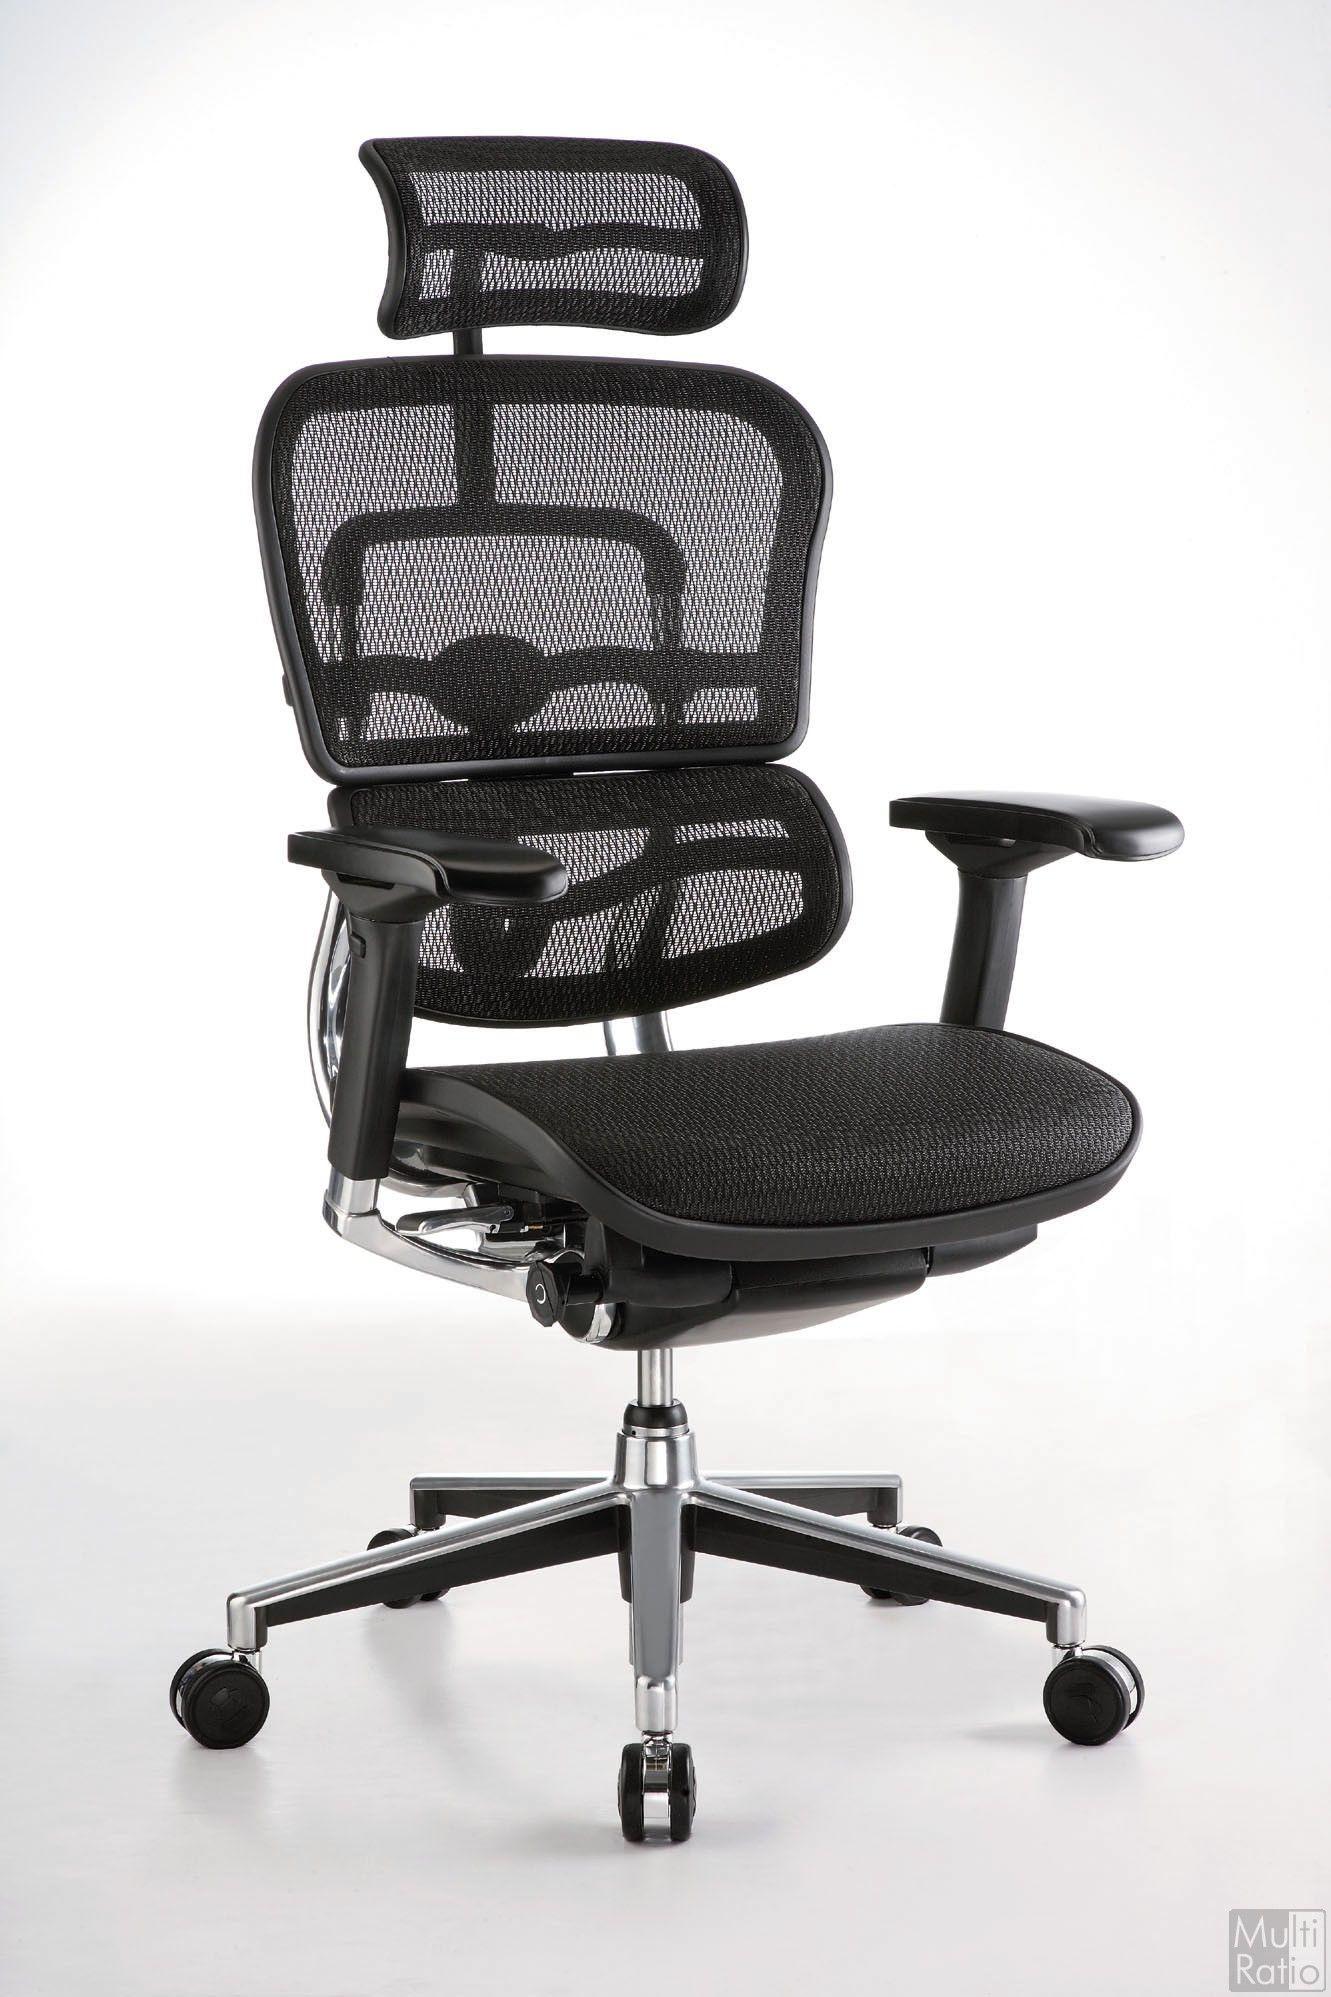 Ergonomische design bureaustoel E Human | Multi ratio